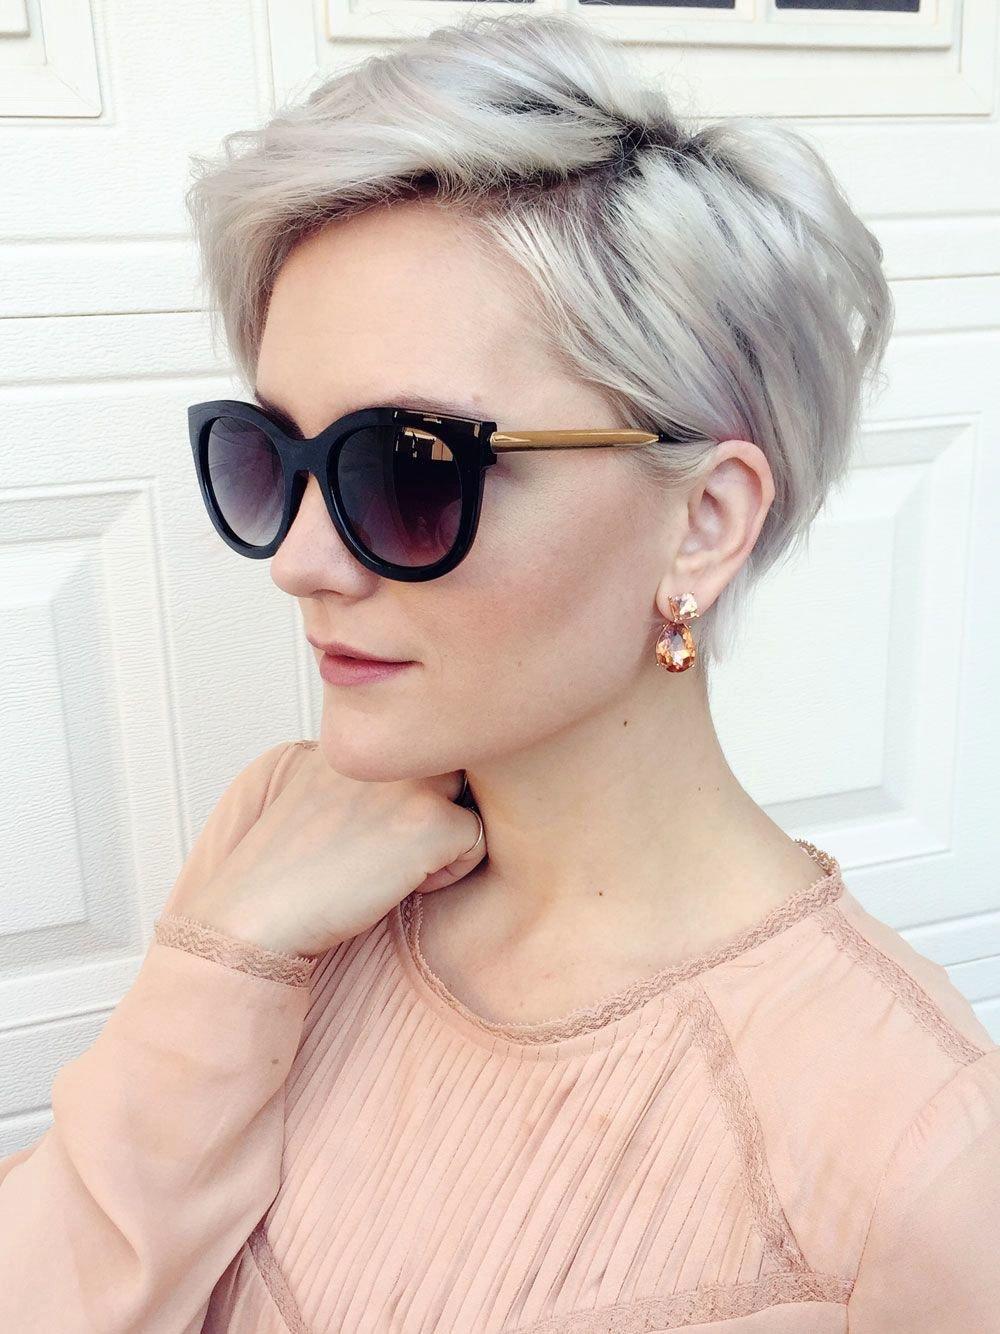 Pixie hair trend